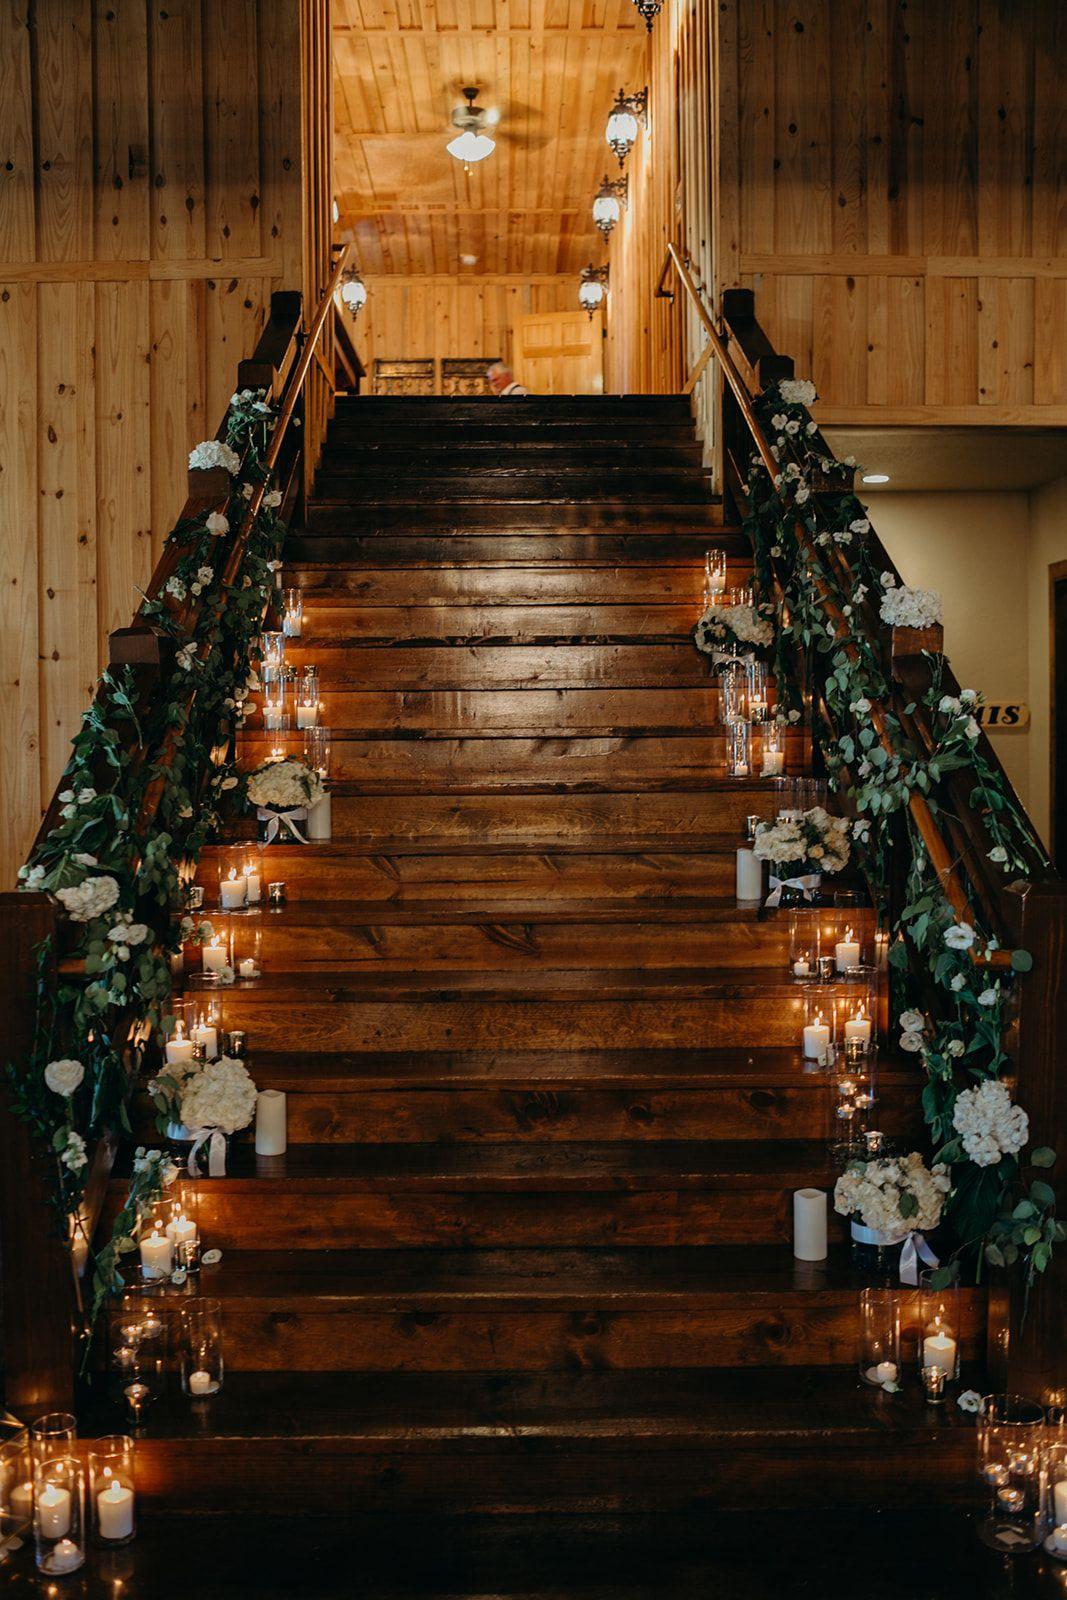 Elegant Wedding Staircase Decorations Wedding Staircase Decor